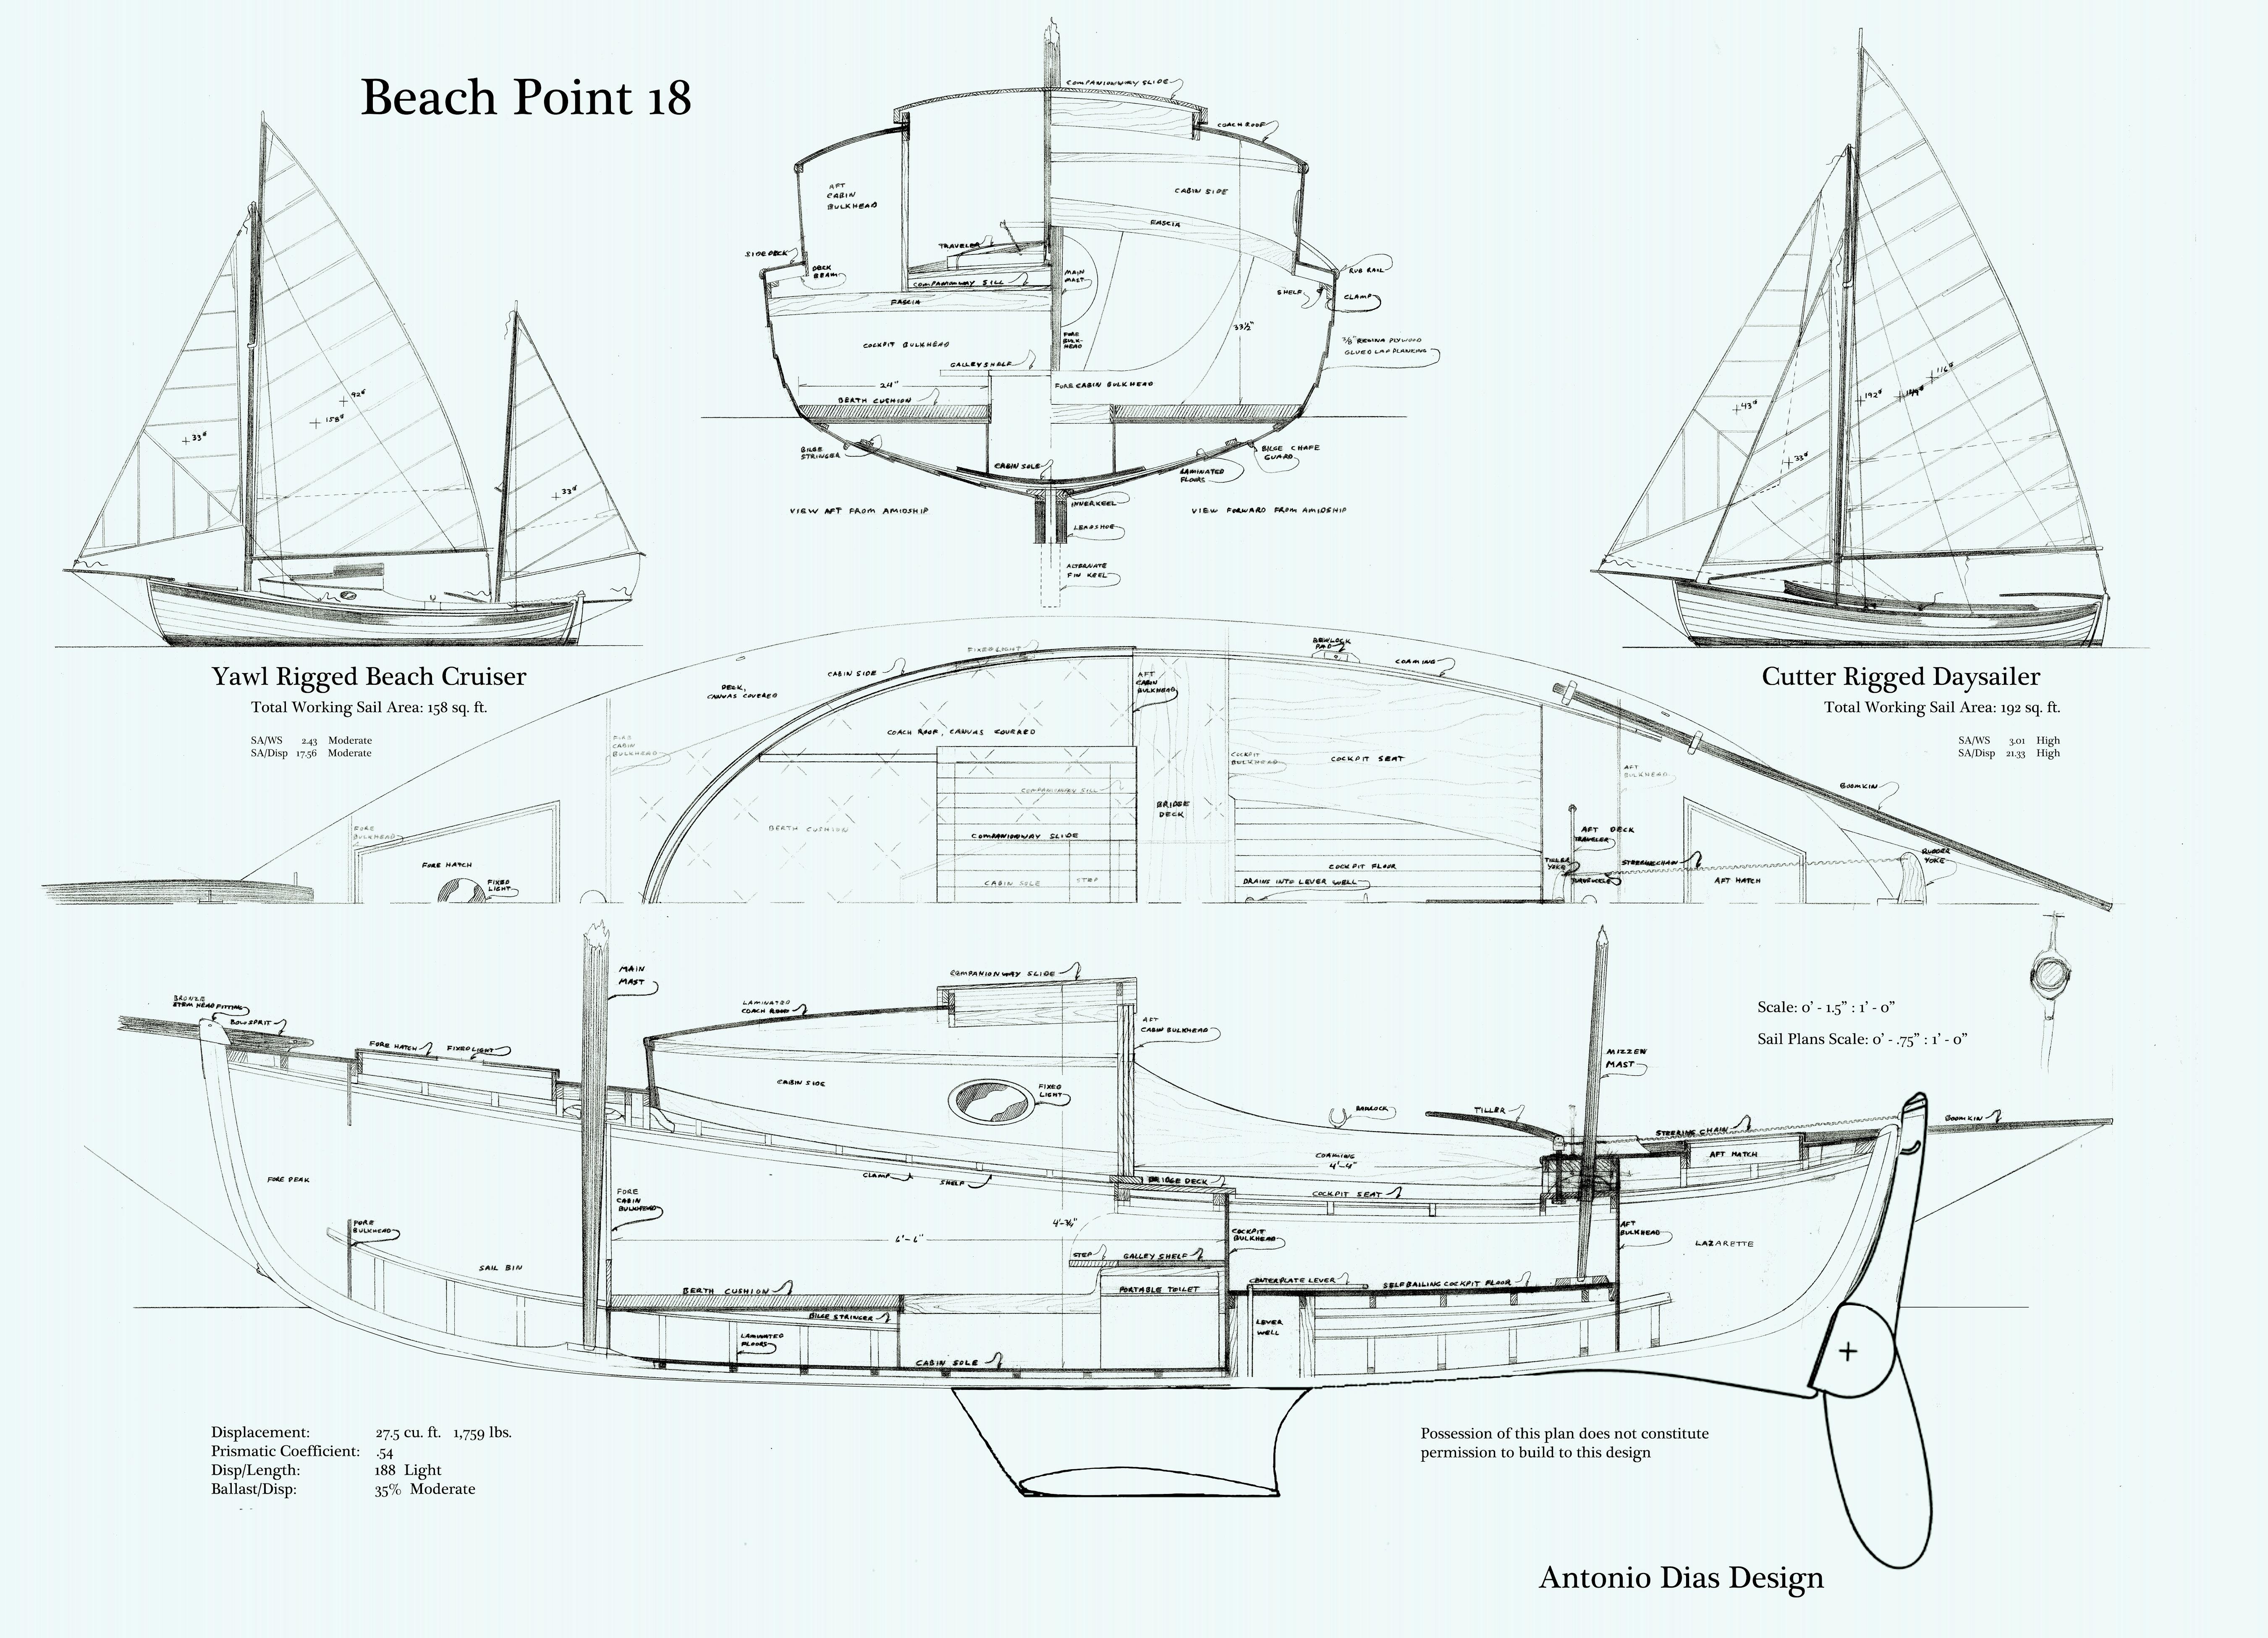 Beach Point 18 Arrangement Plan & Sail Plans keeled